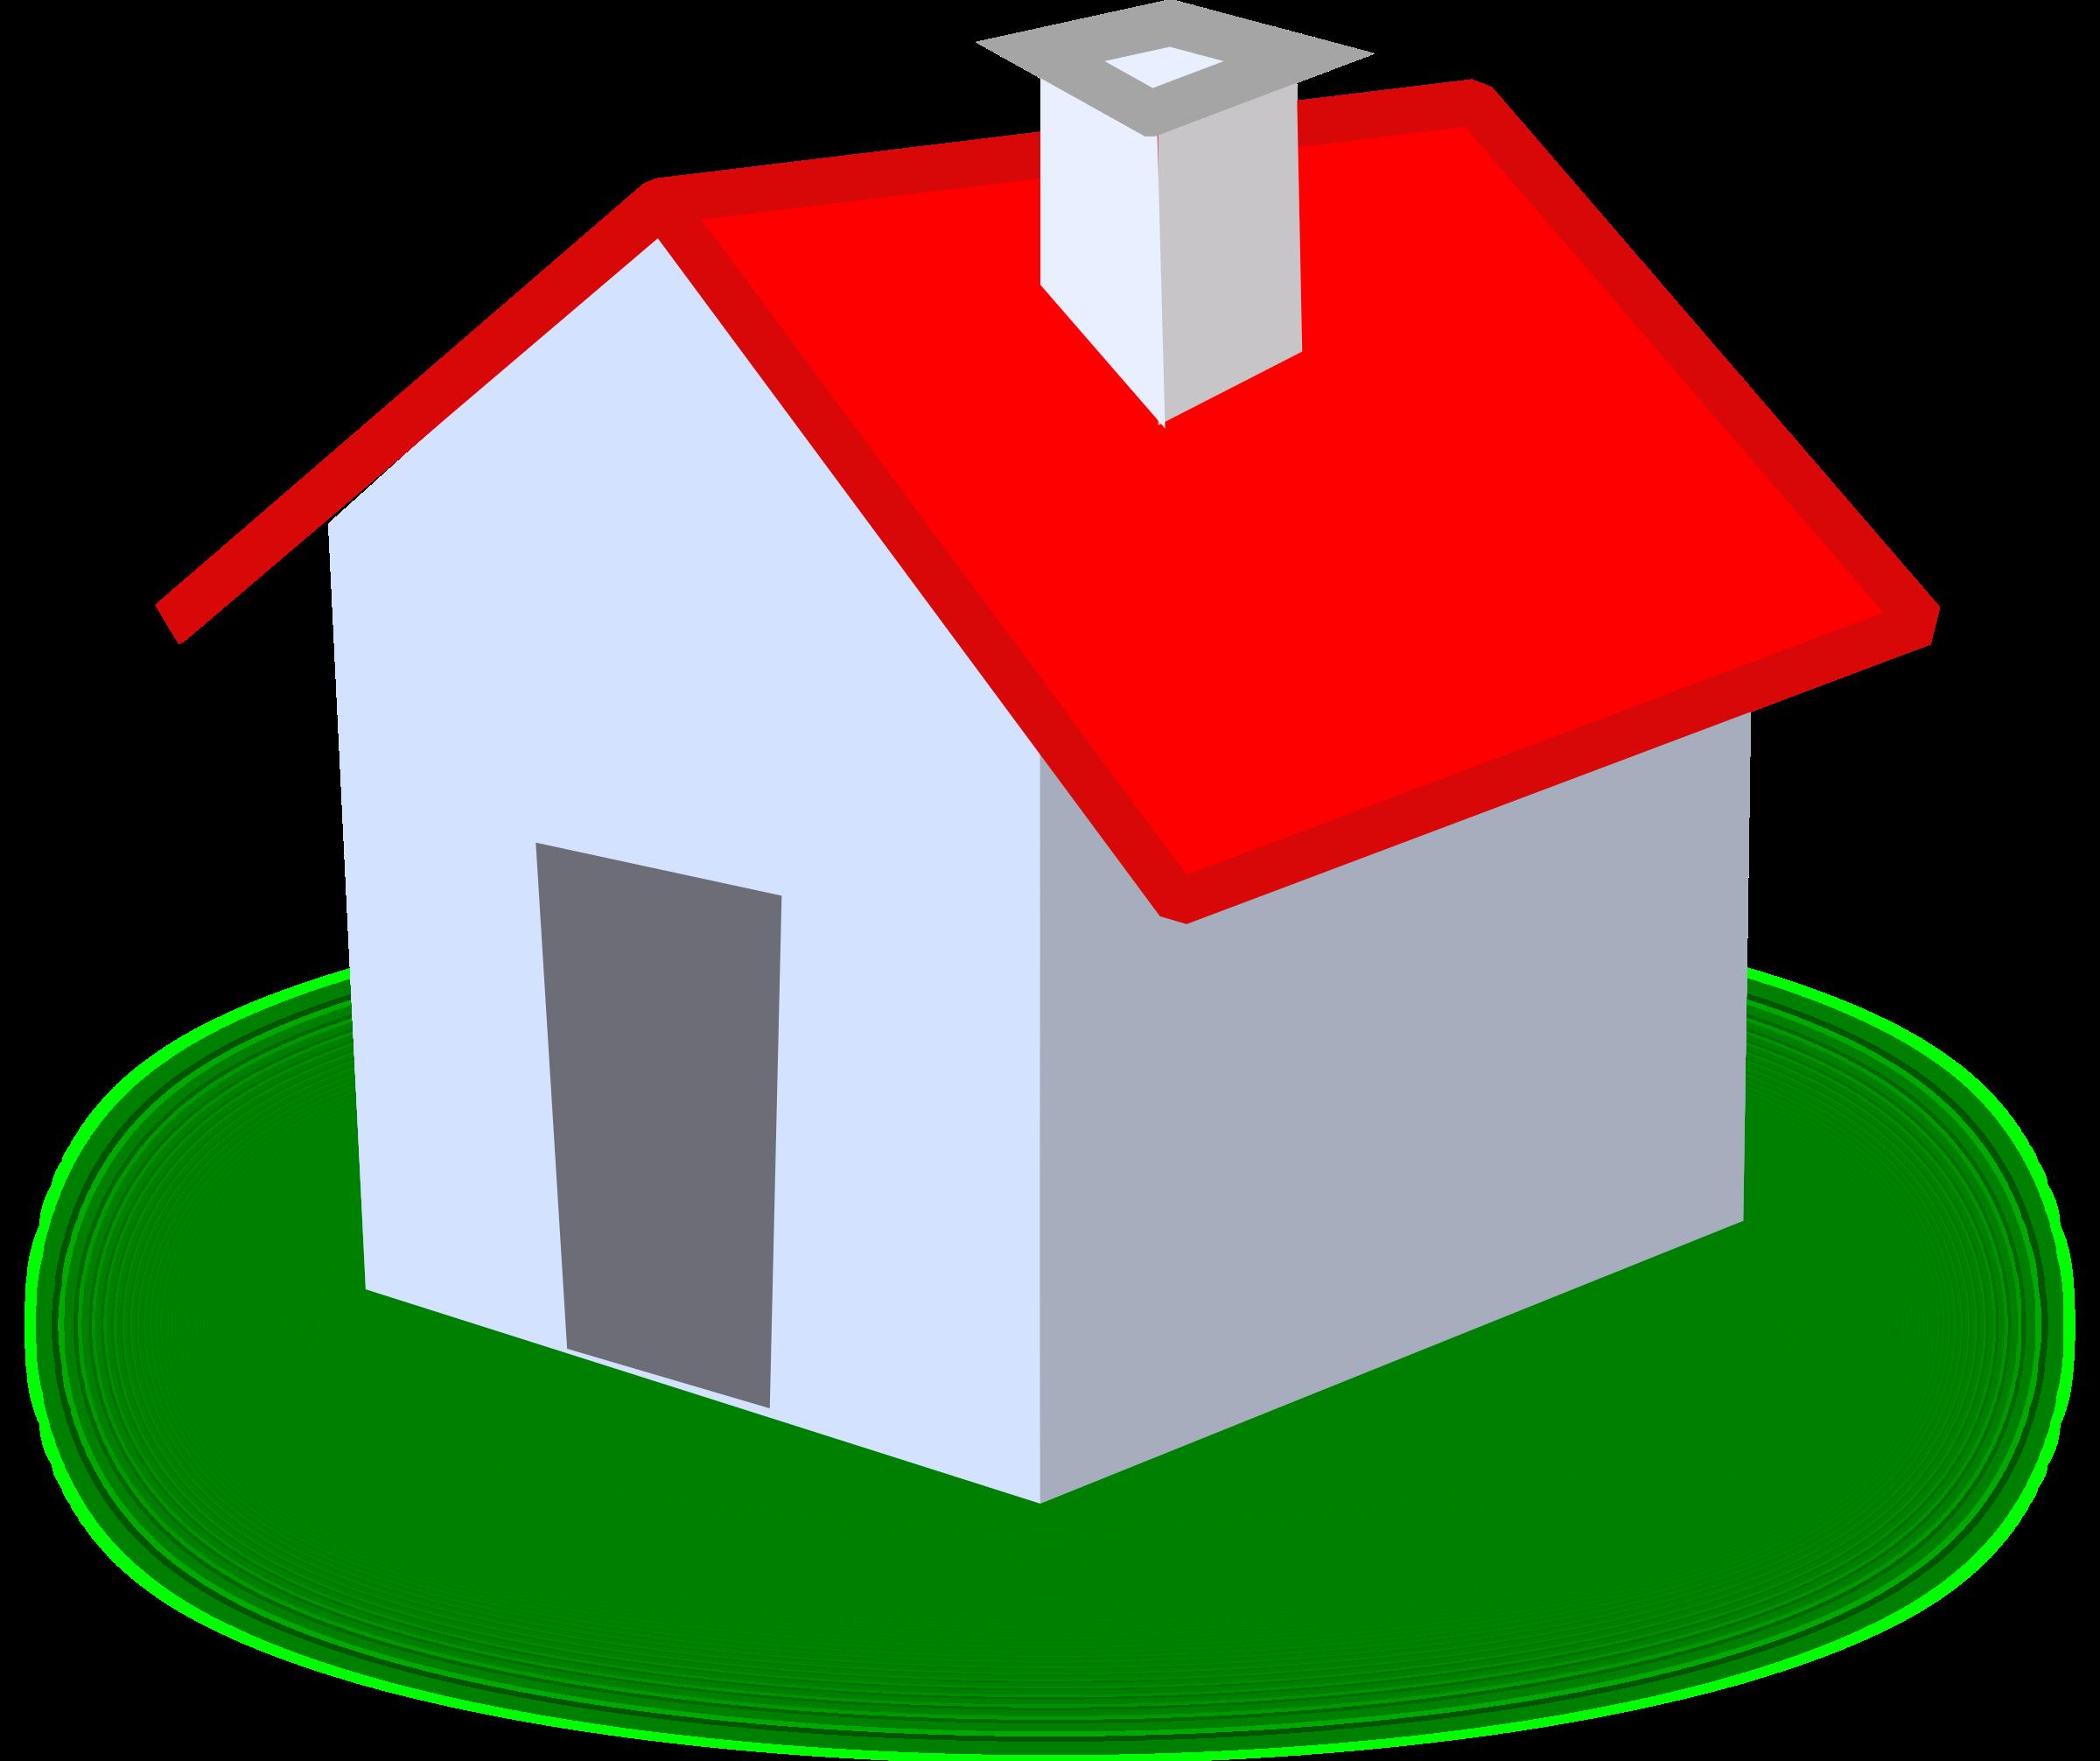 House clipart diagram. Big image png